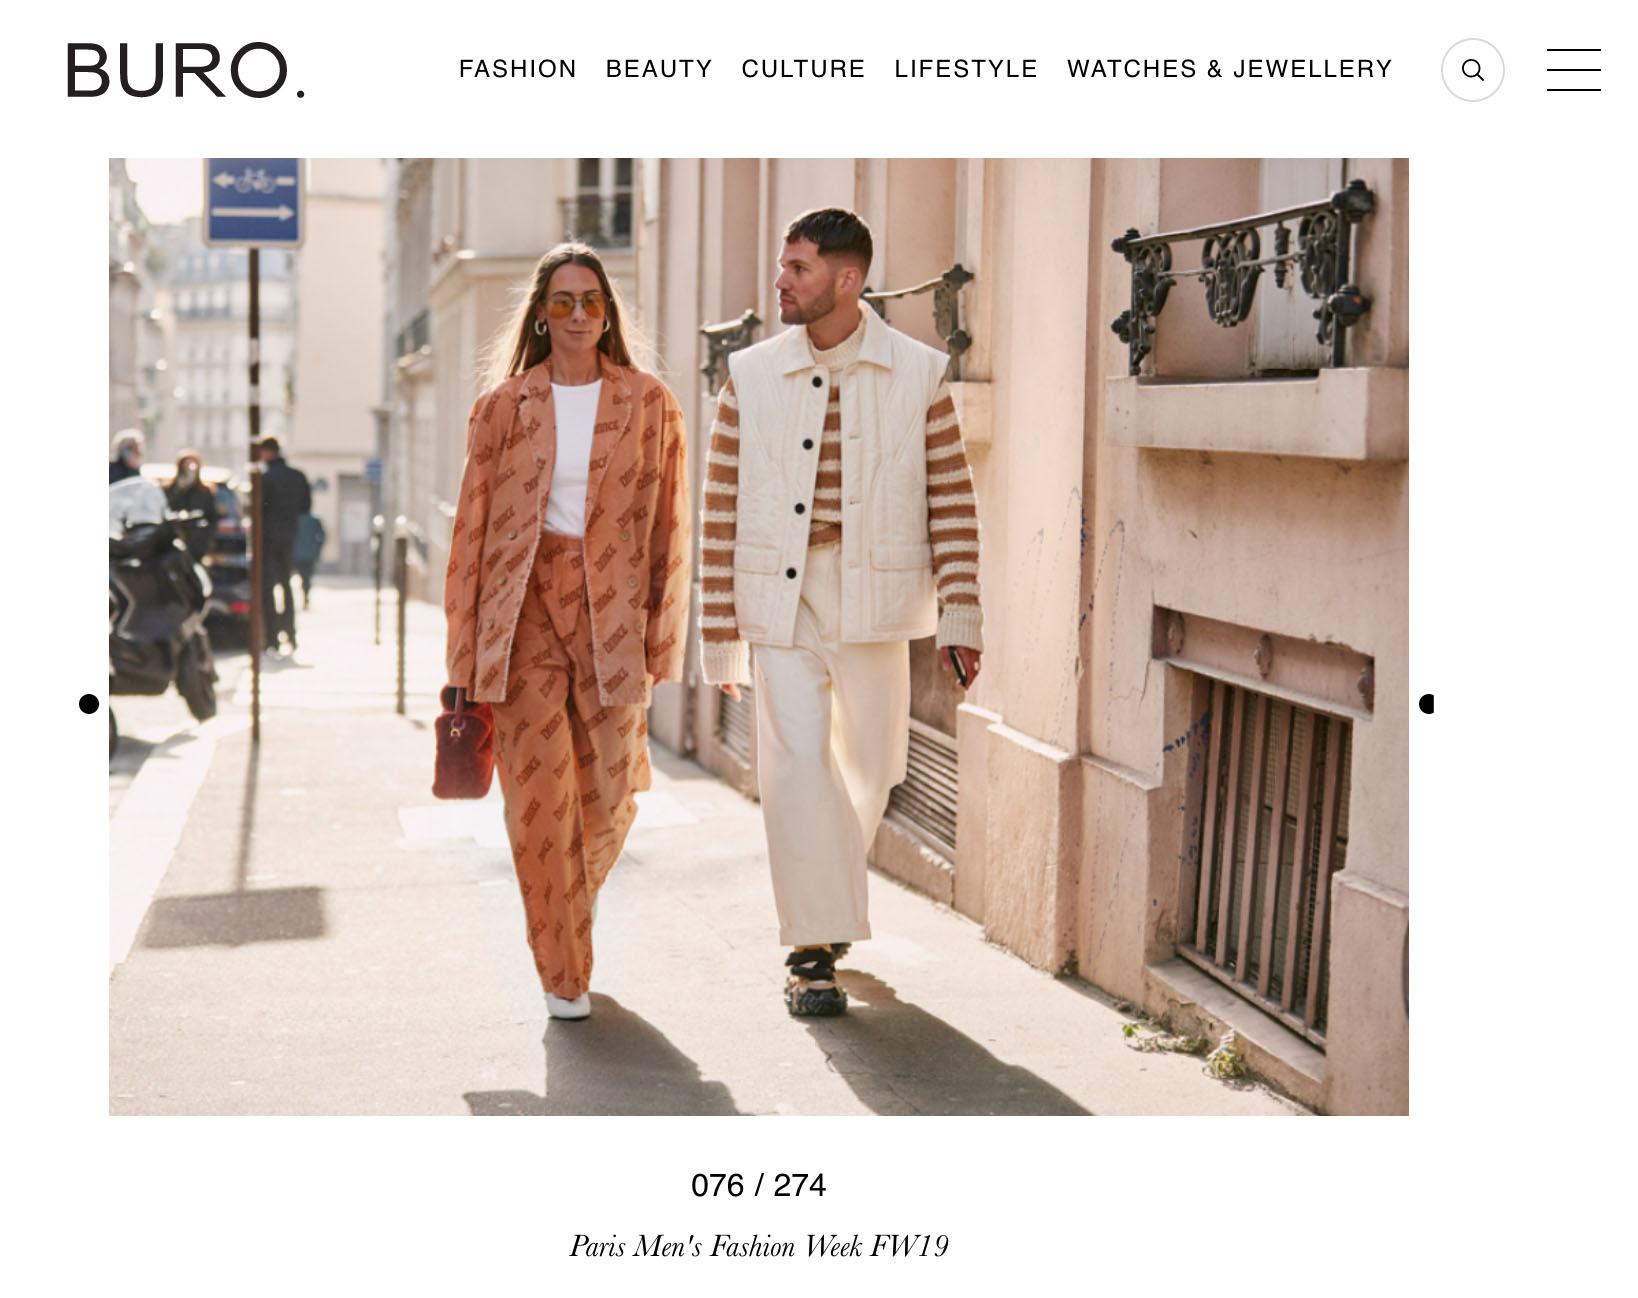 fashion week street style couple